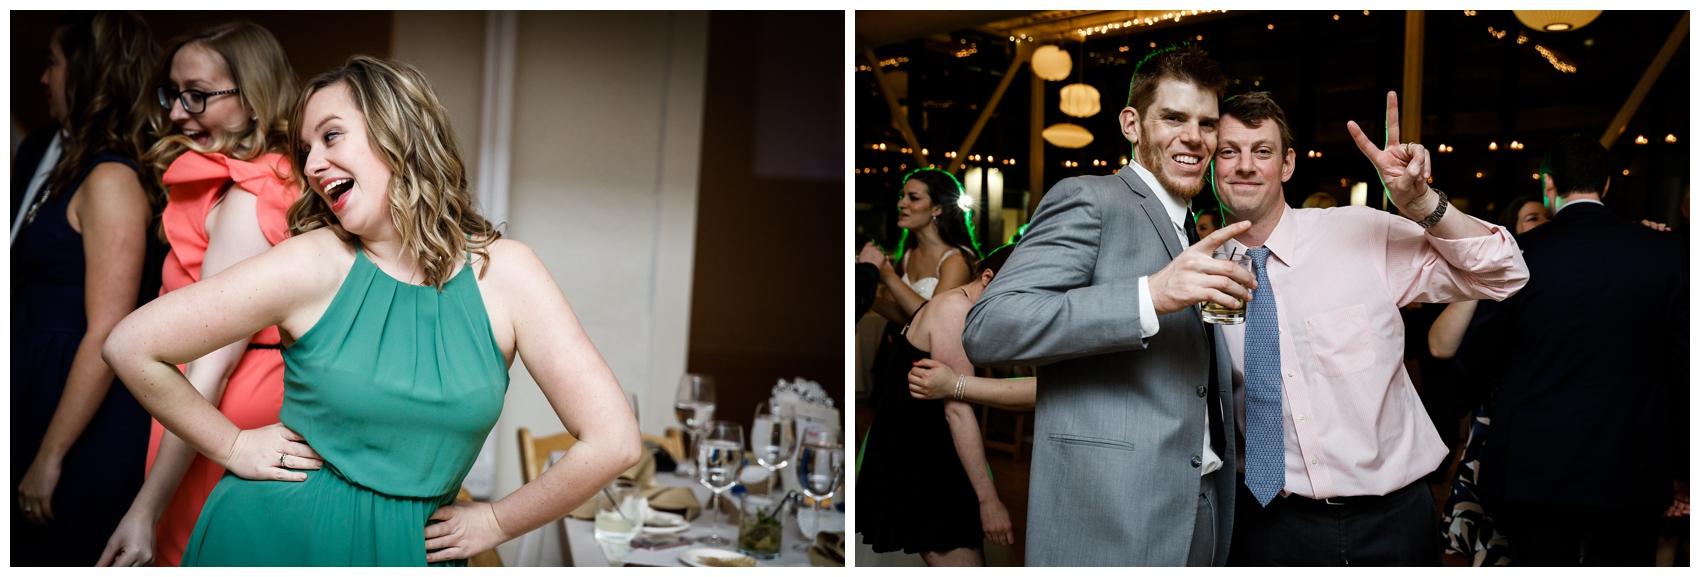 wedding reception at Chicago's Greenhouse Loft